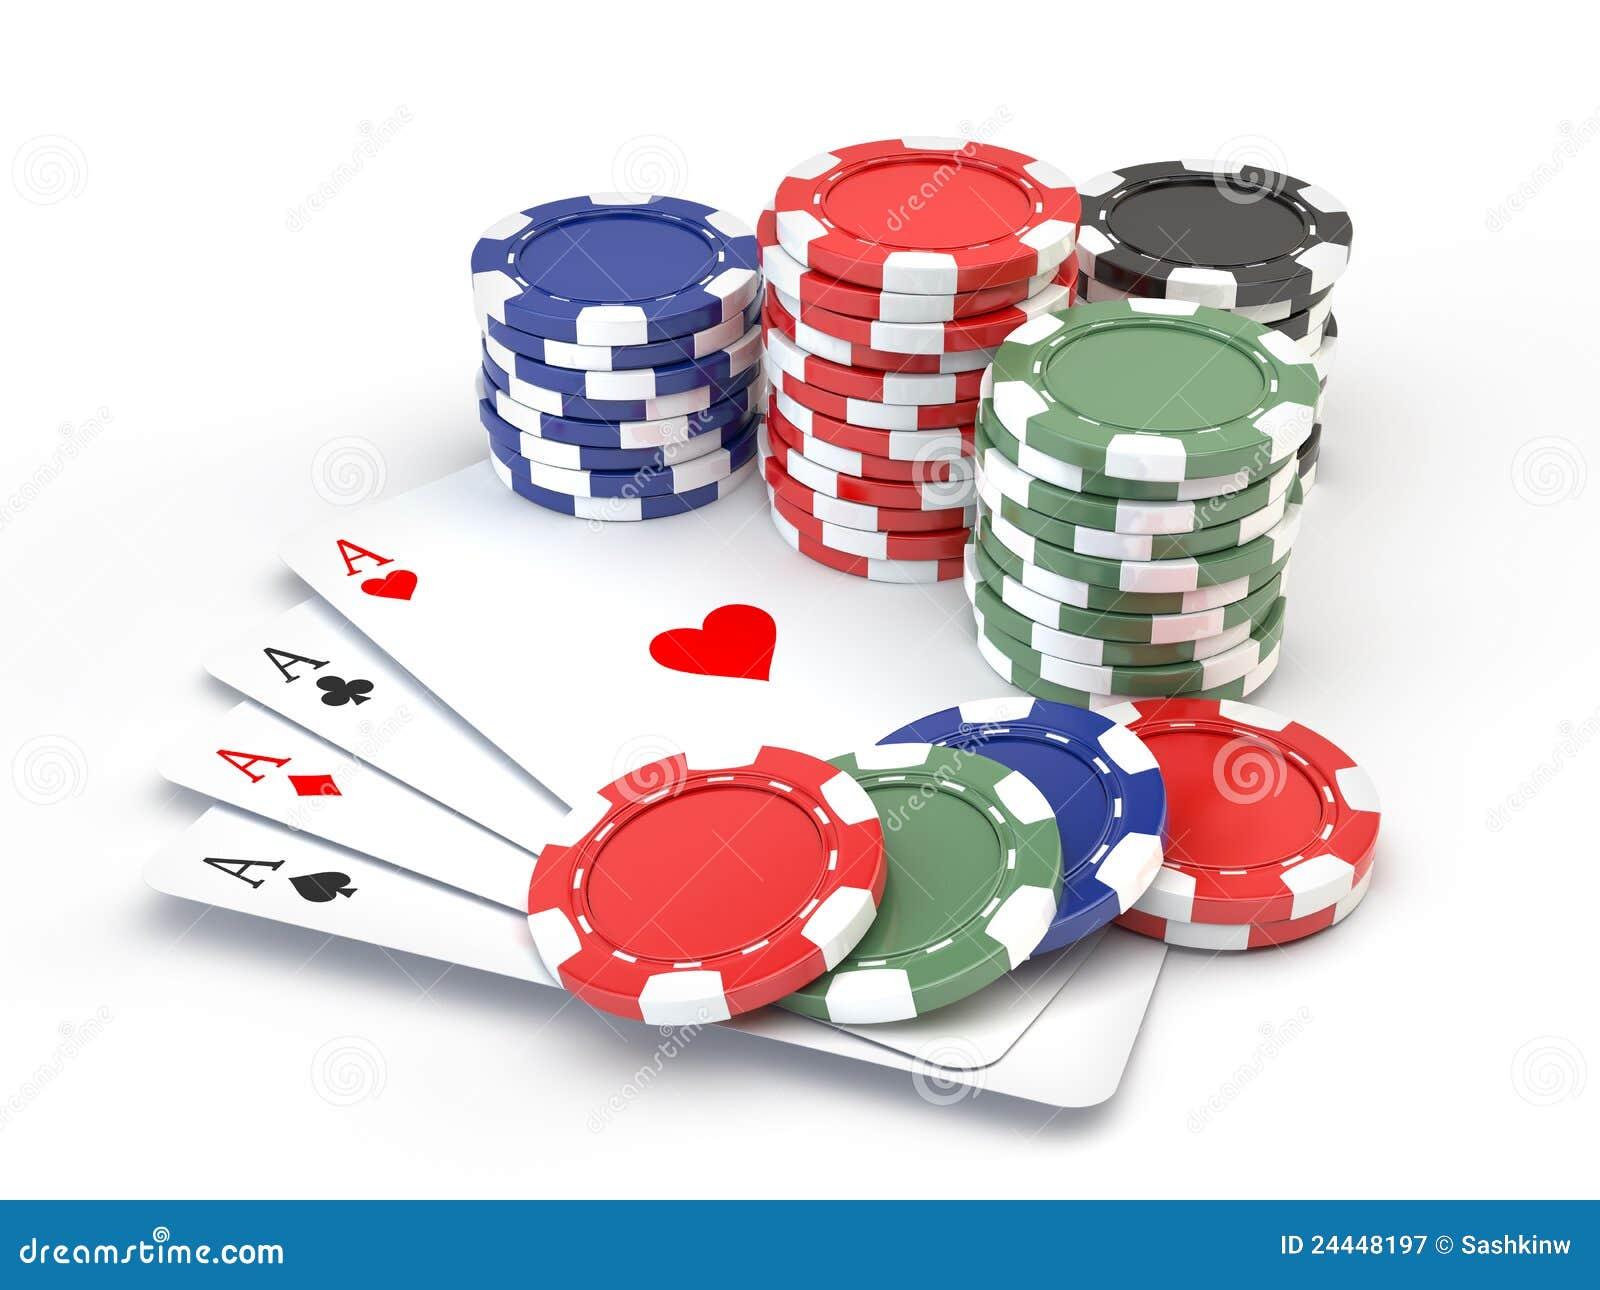 Free Casino Games & Slots